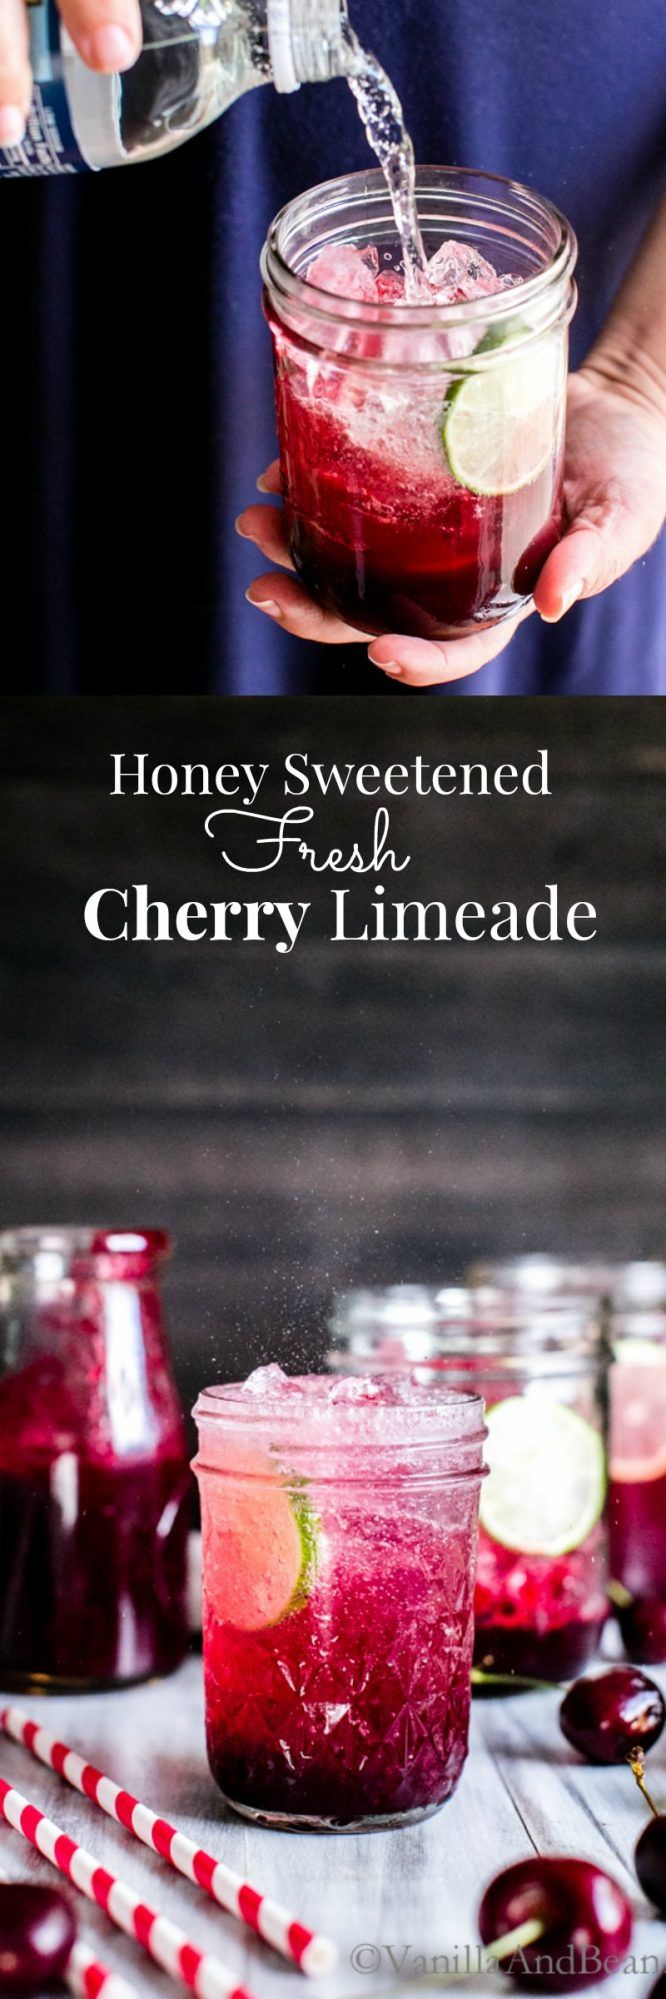 Honey Sweetened Fresh Cherry Limeade made in the Vitamix